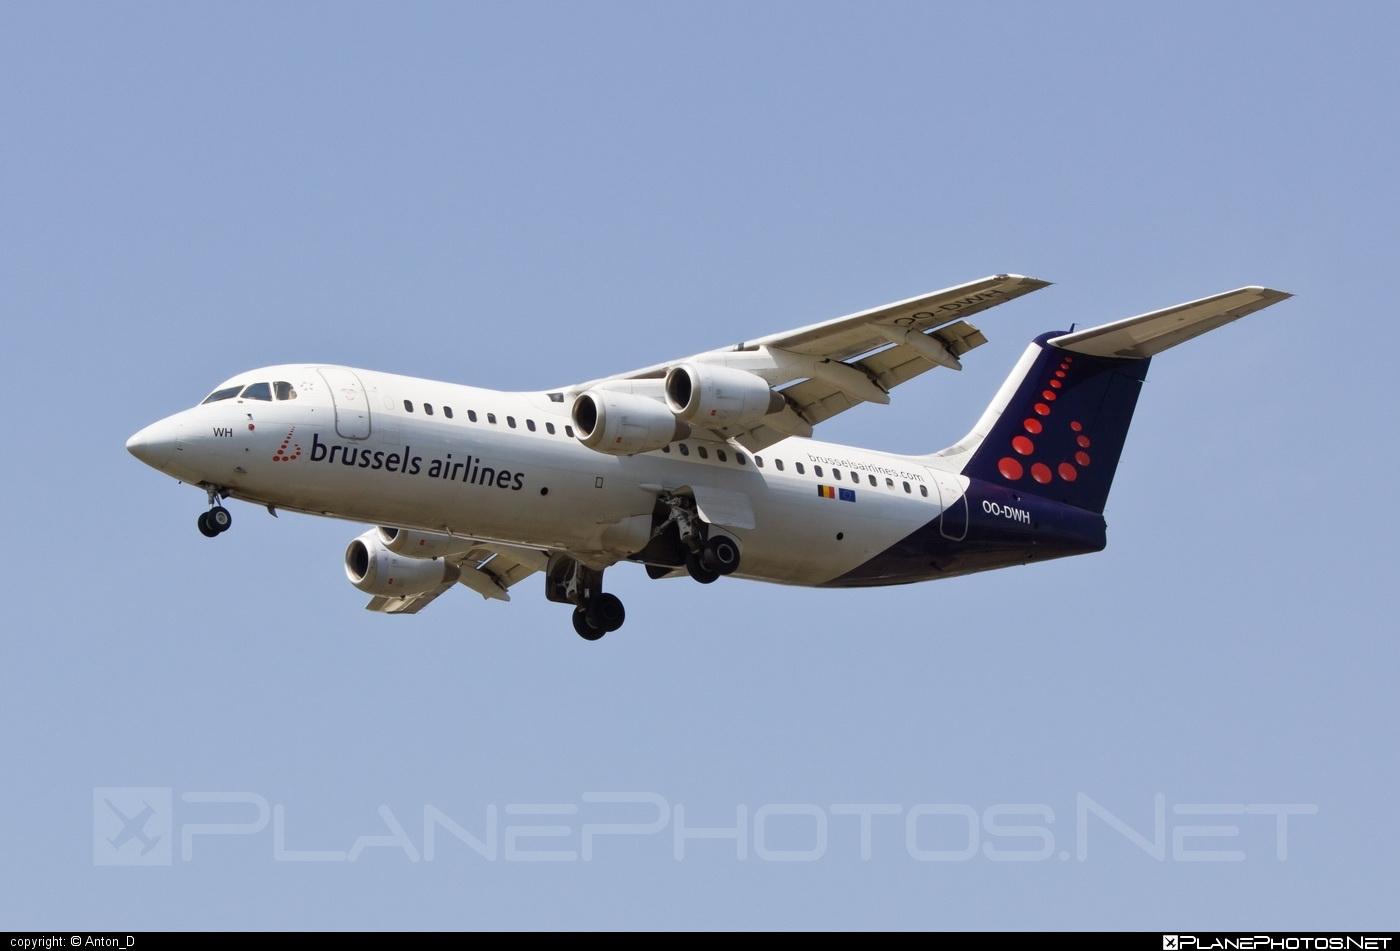 British Aerospace Avro RJ100 - OO-DWH operated by Brussels Airlines #avro146rj100 #avrorj100 #bae146 #britishaerospace #brusselsairlines